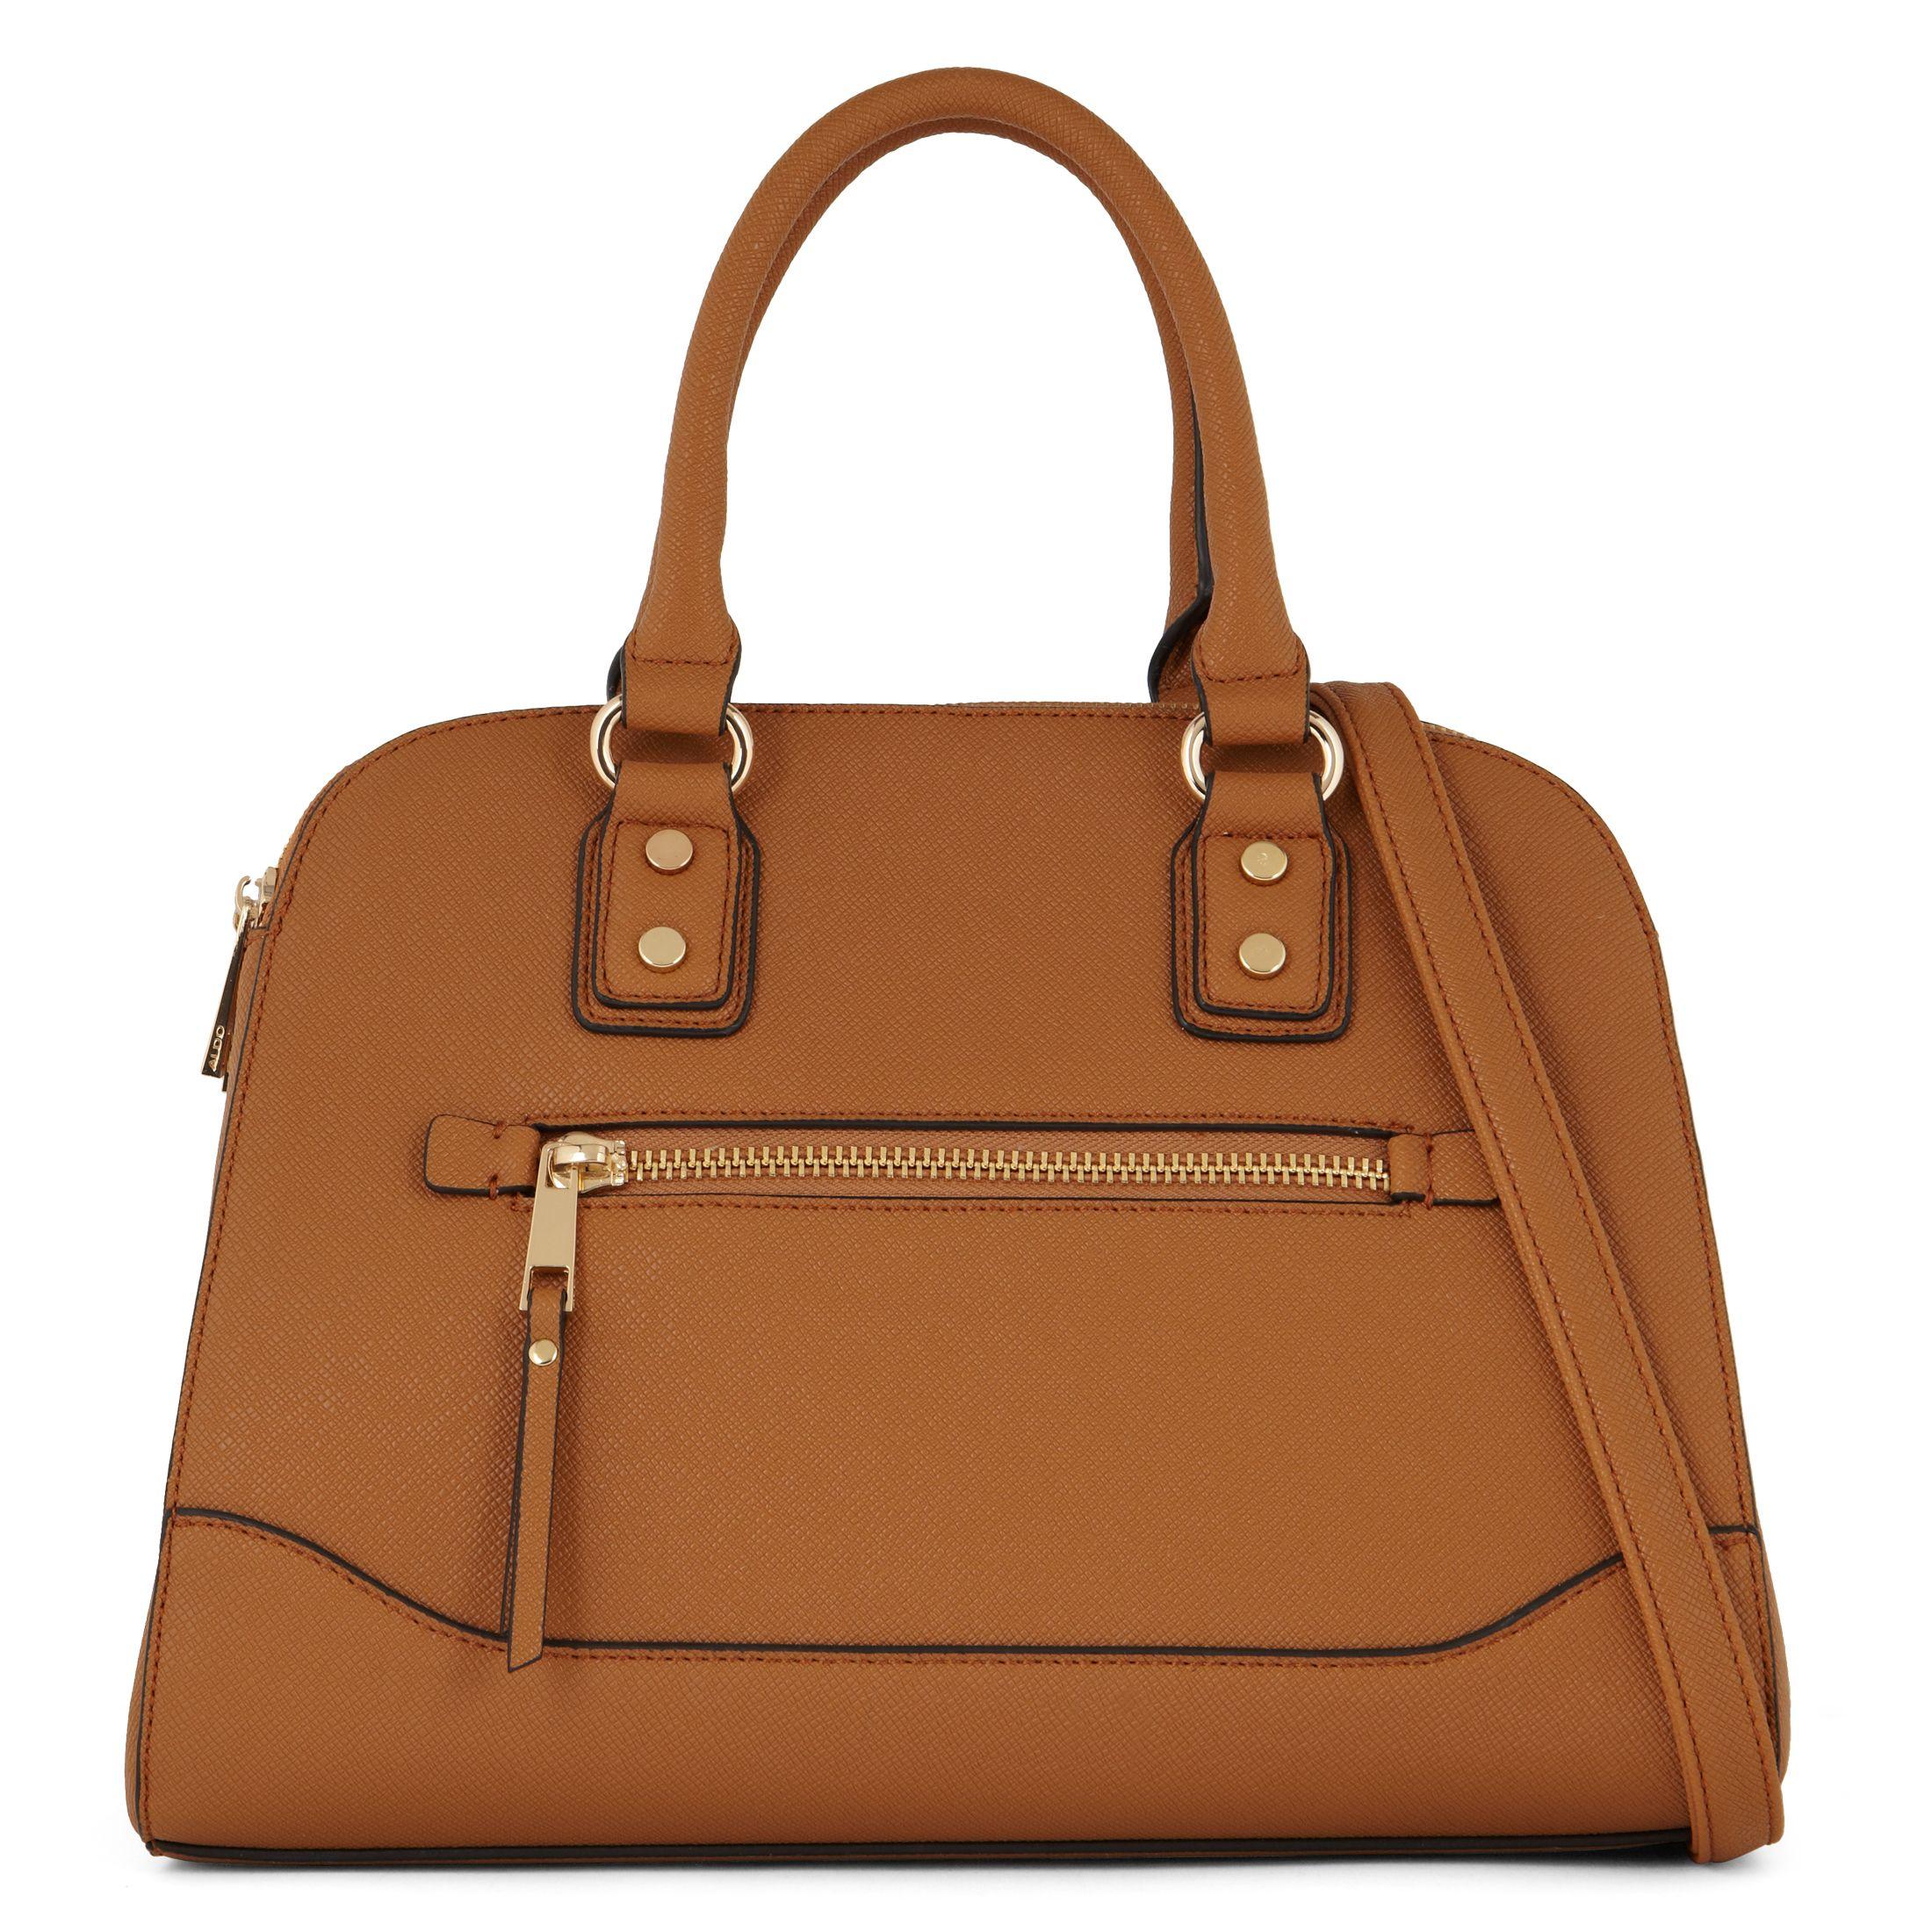 Aldo Anakardo Satchel Bag in Brown   Lyst